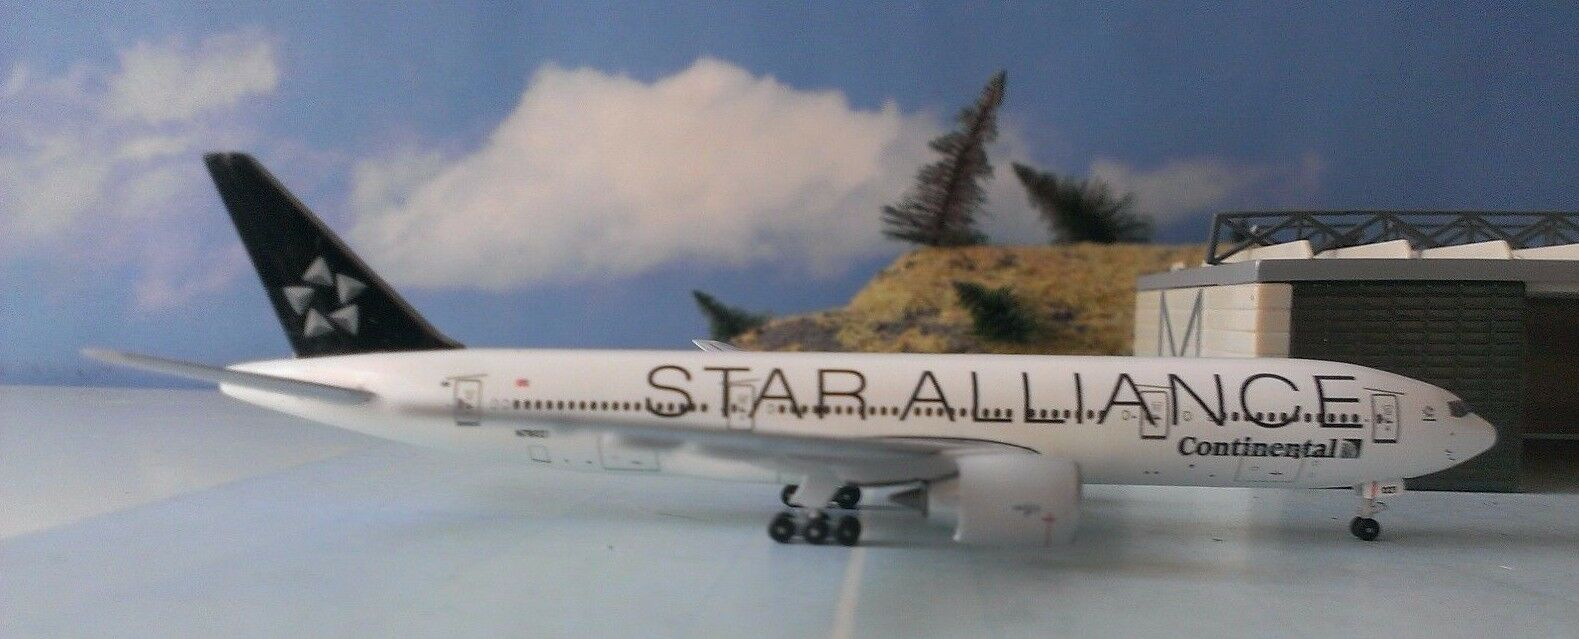 Aero500 1 500 Continental Star Star Star Alliance B777-200 N78021 & Herpa Wings Katalog 378cbc